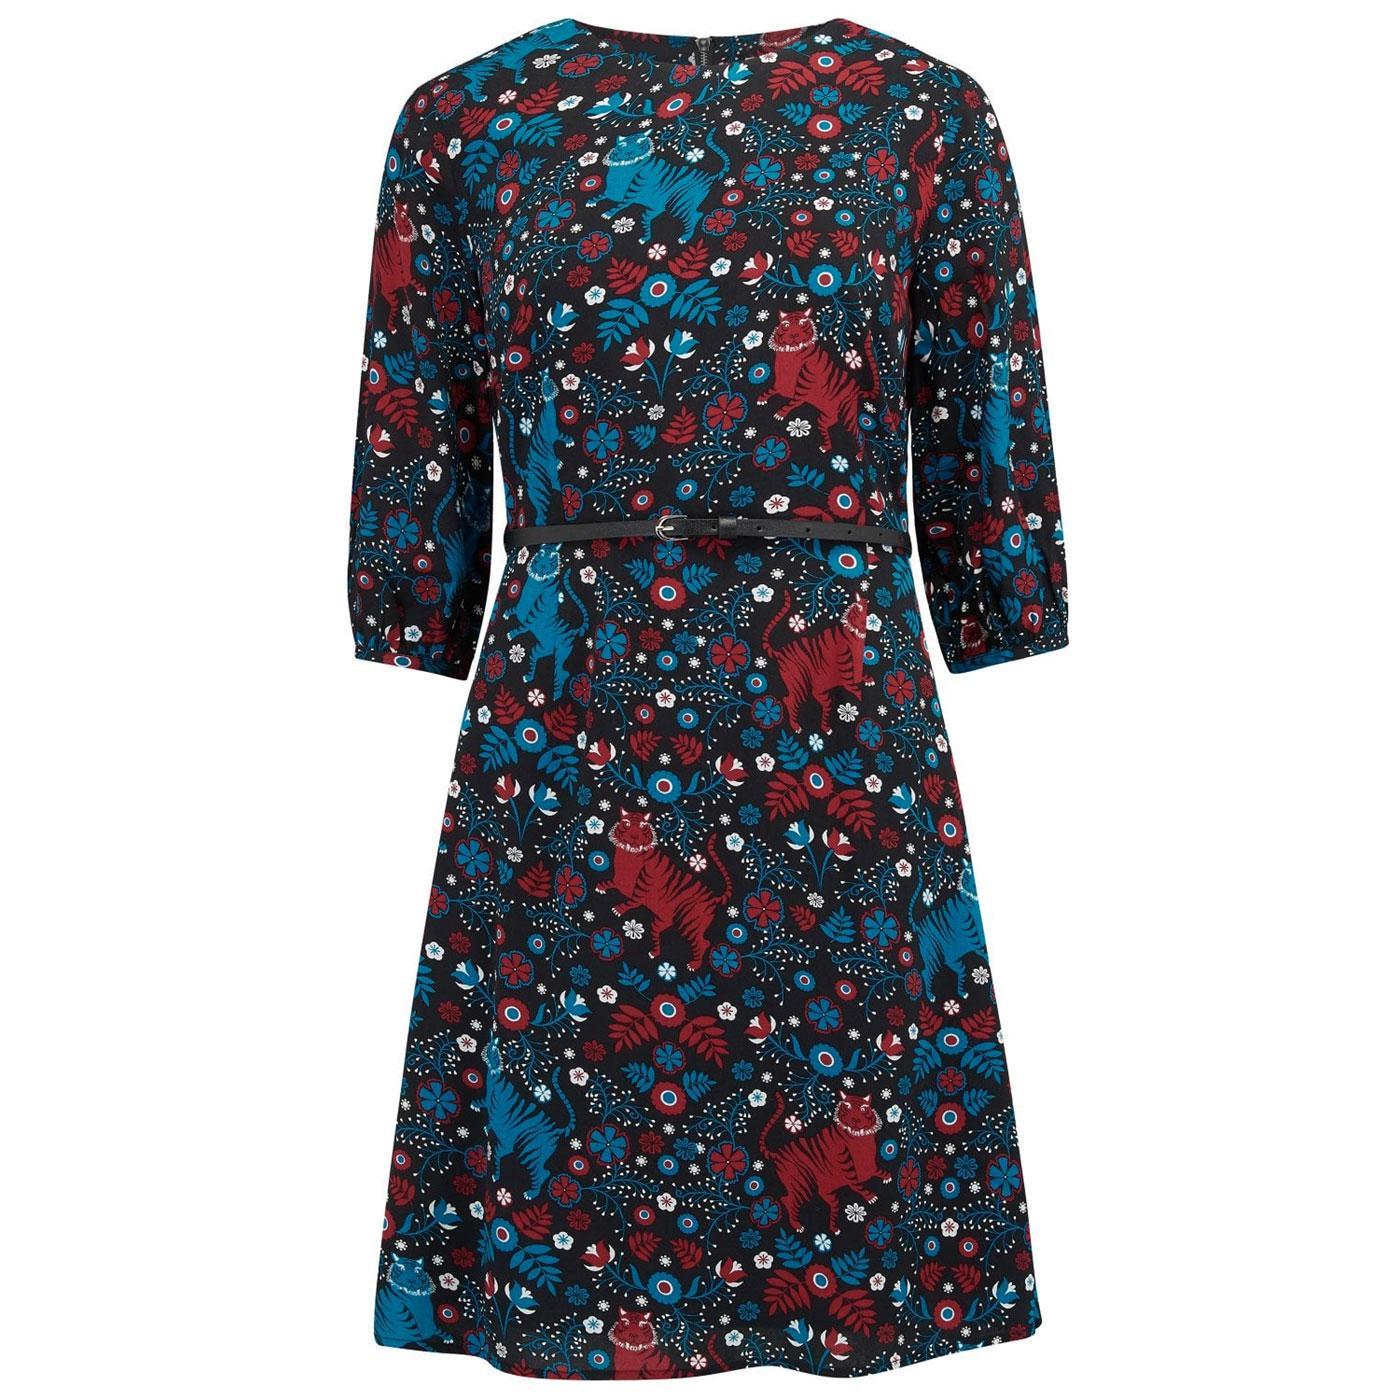 Cate Tiger Folk Art SUGARHILL BOUTIQUE Dress Black